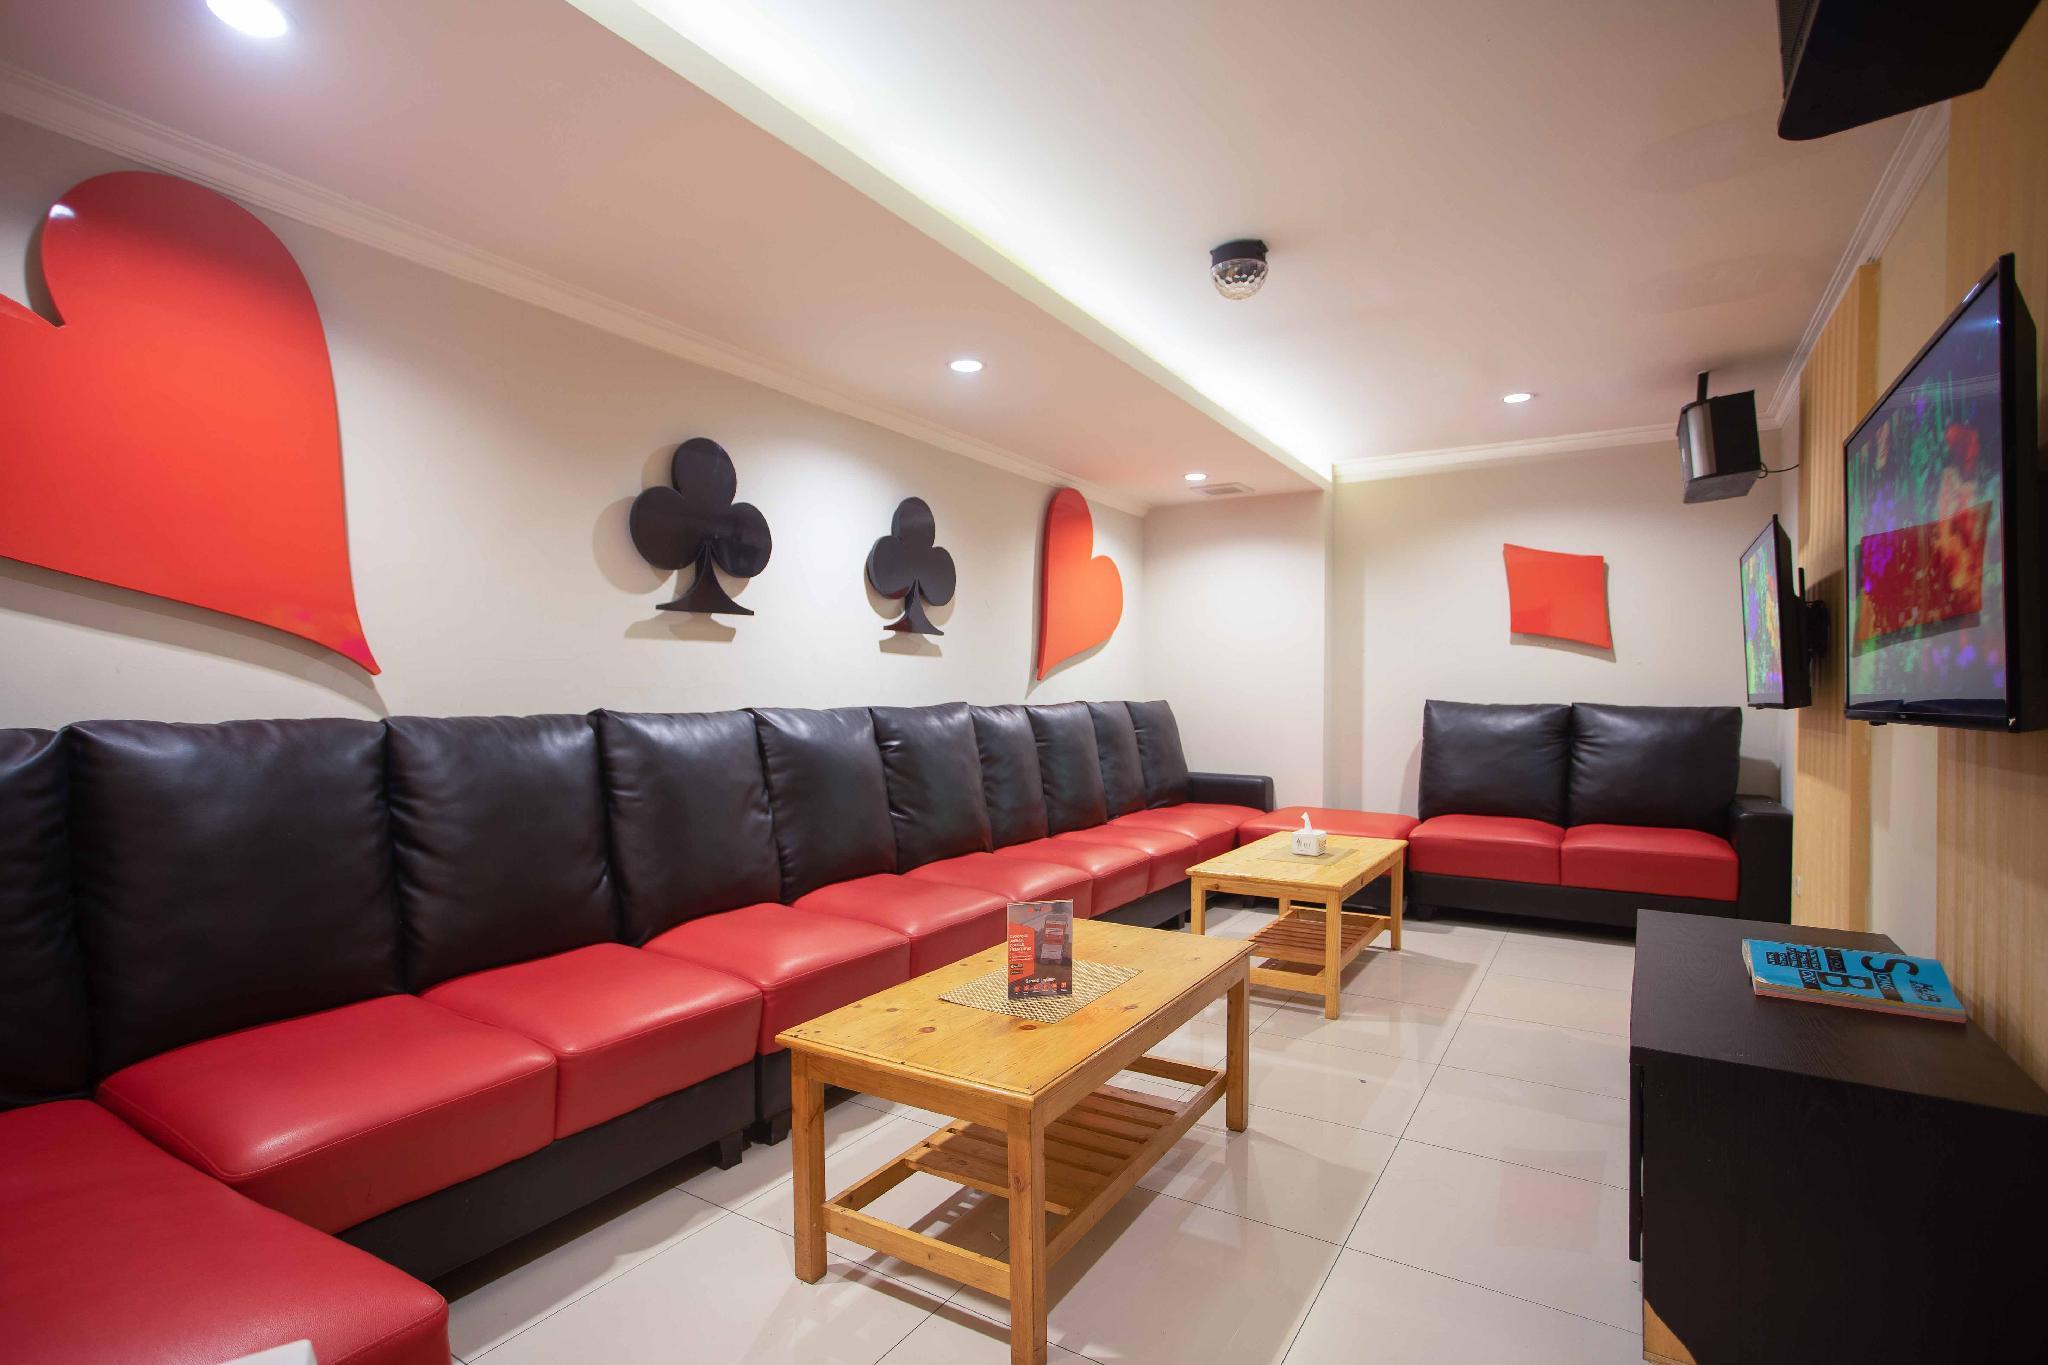 Discount RedDoorz Premium near Kawasan Industri Cikarang